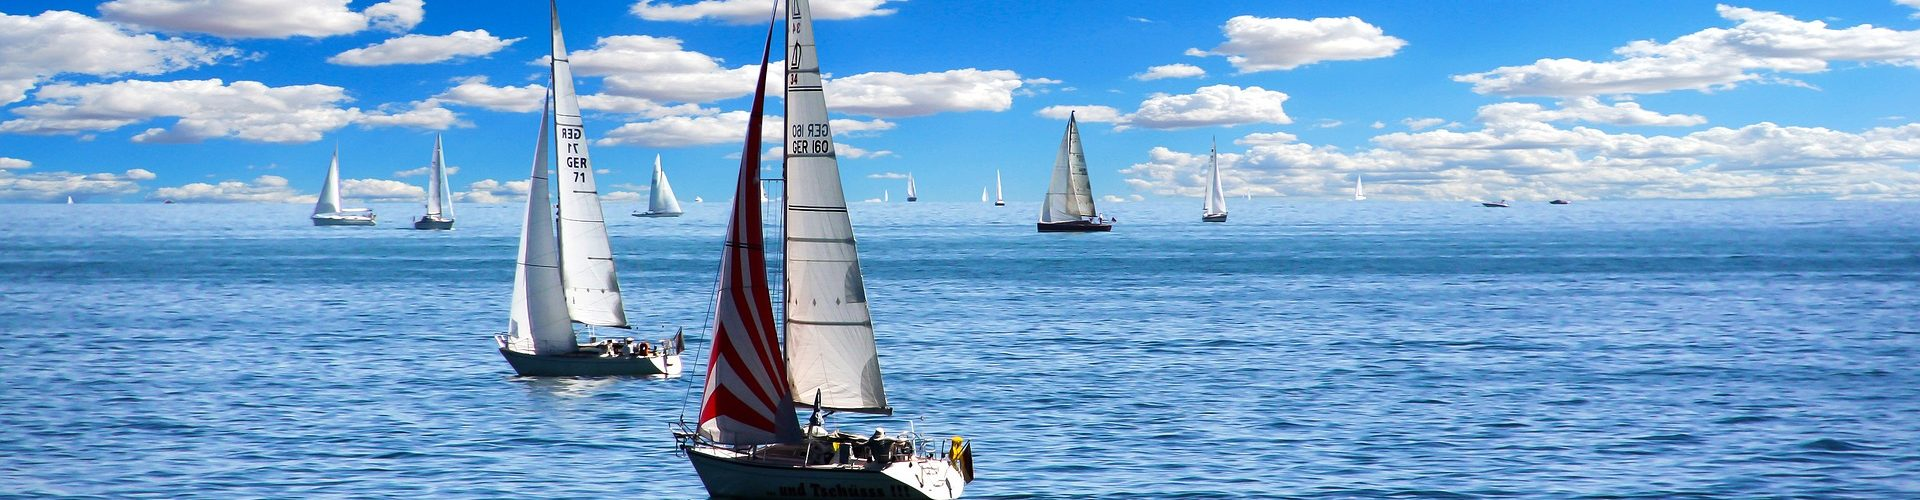 segeln lernen in WittstockDosse segelschein machen in WittstockDosse 1920x500 - Segeln lernen in Wittstock/Dosse